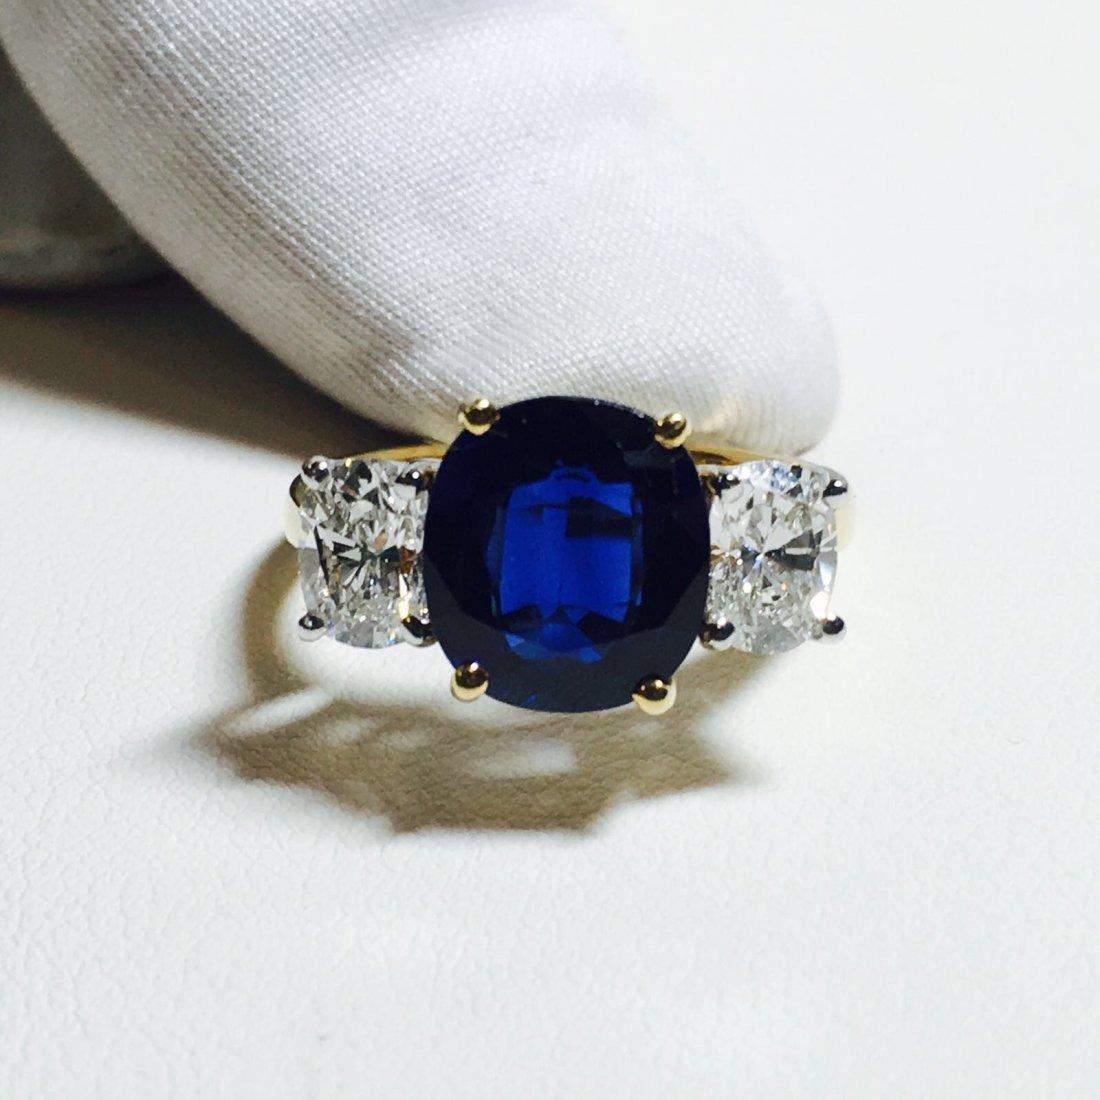 18K Gold, 4.05 Carat Blue Sapphire and Diamond Ring